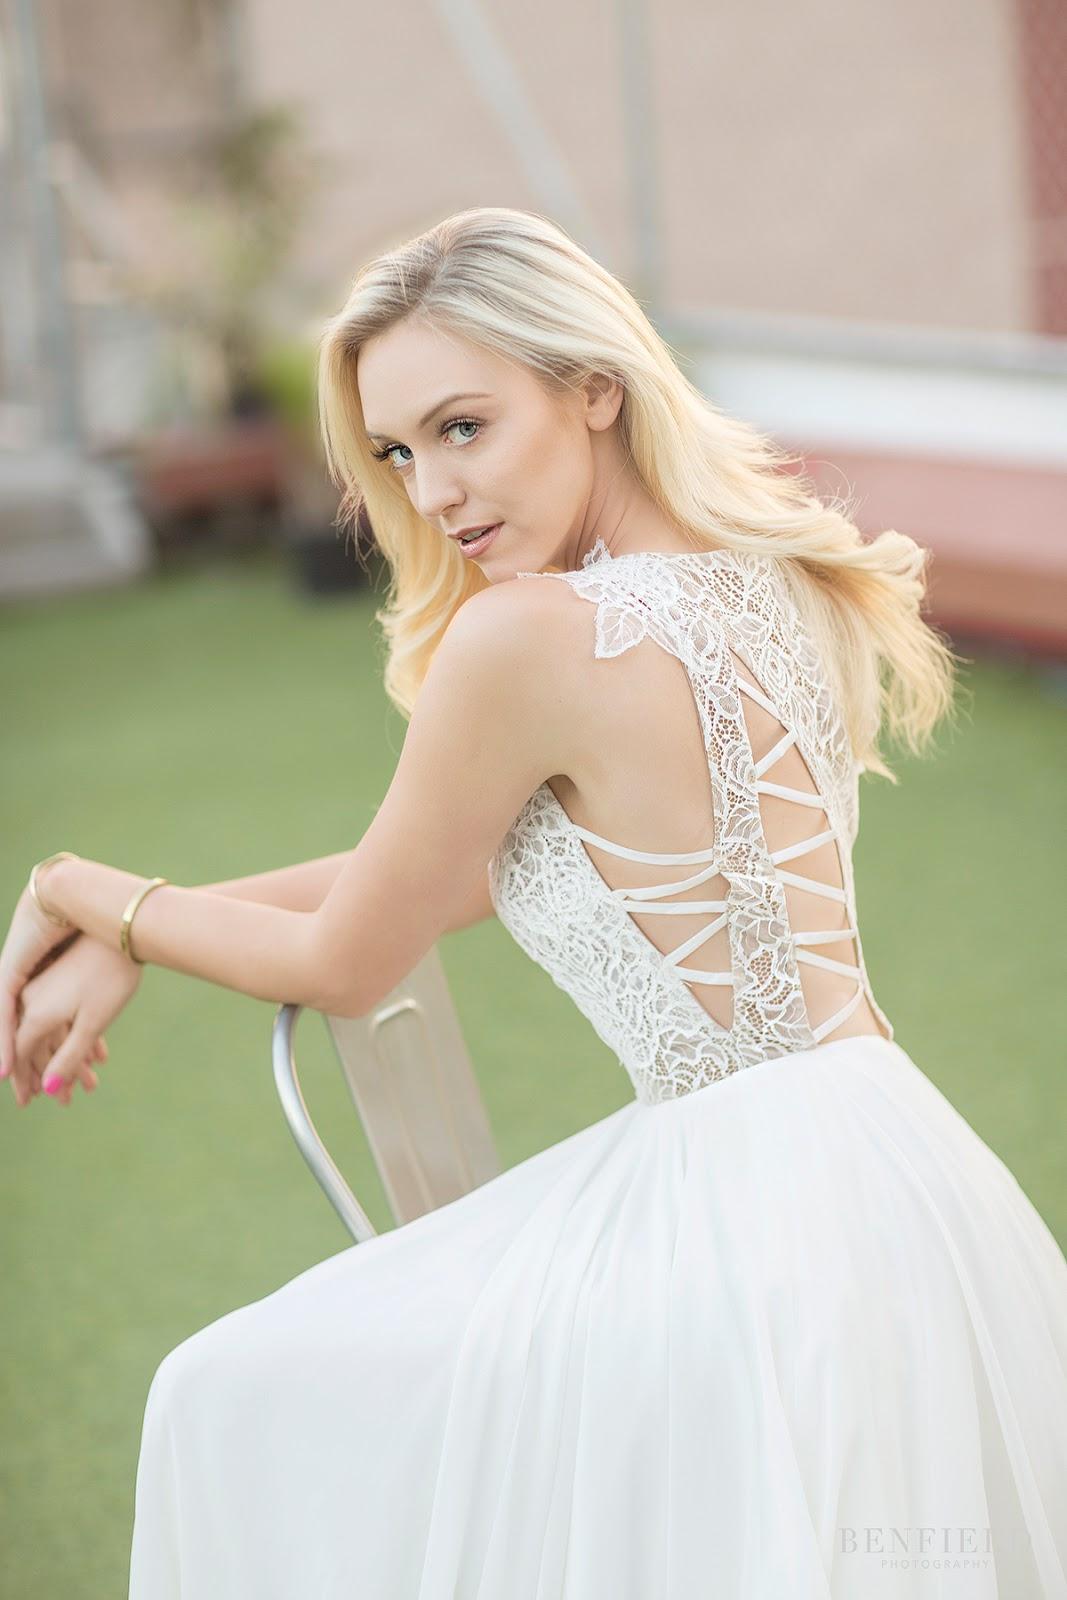 Wedding Dresses In Little Rock Ar 77 Good Talk to you soon